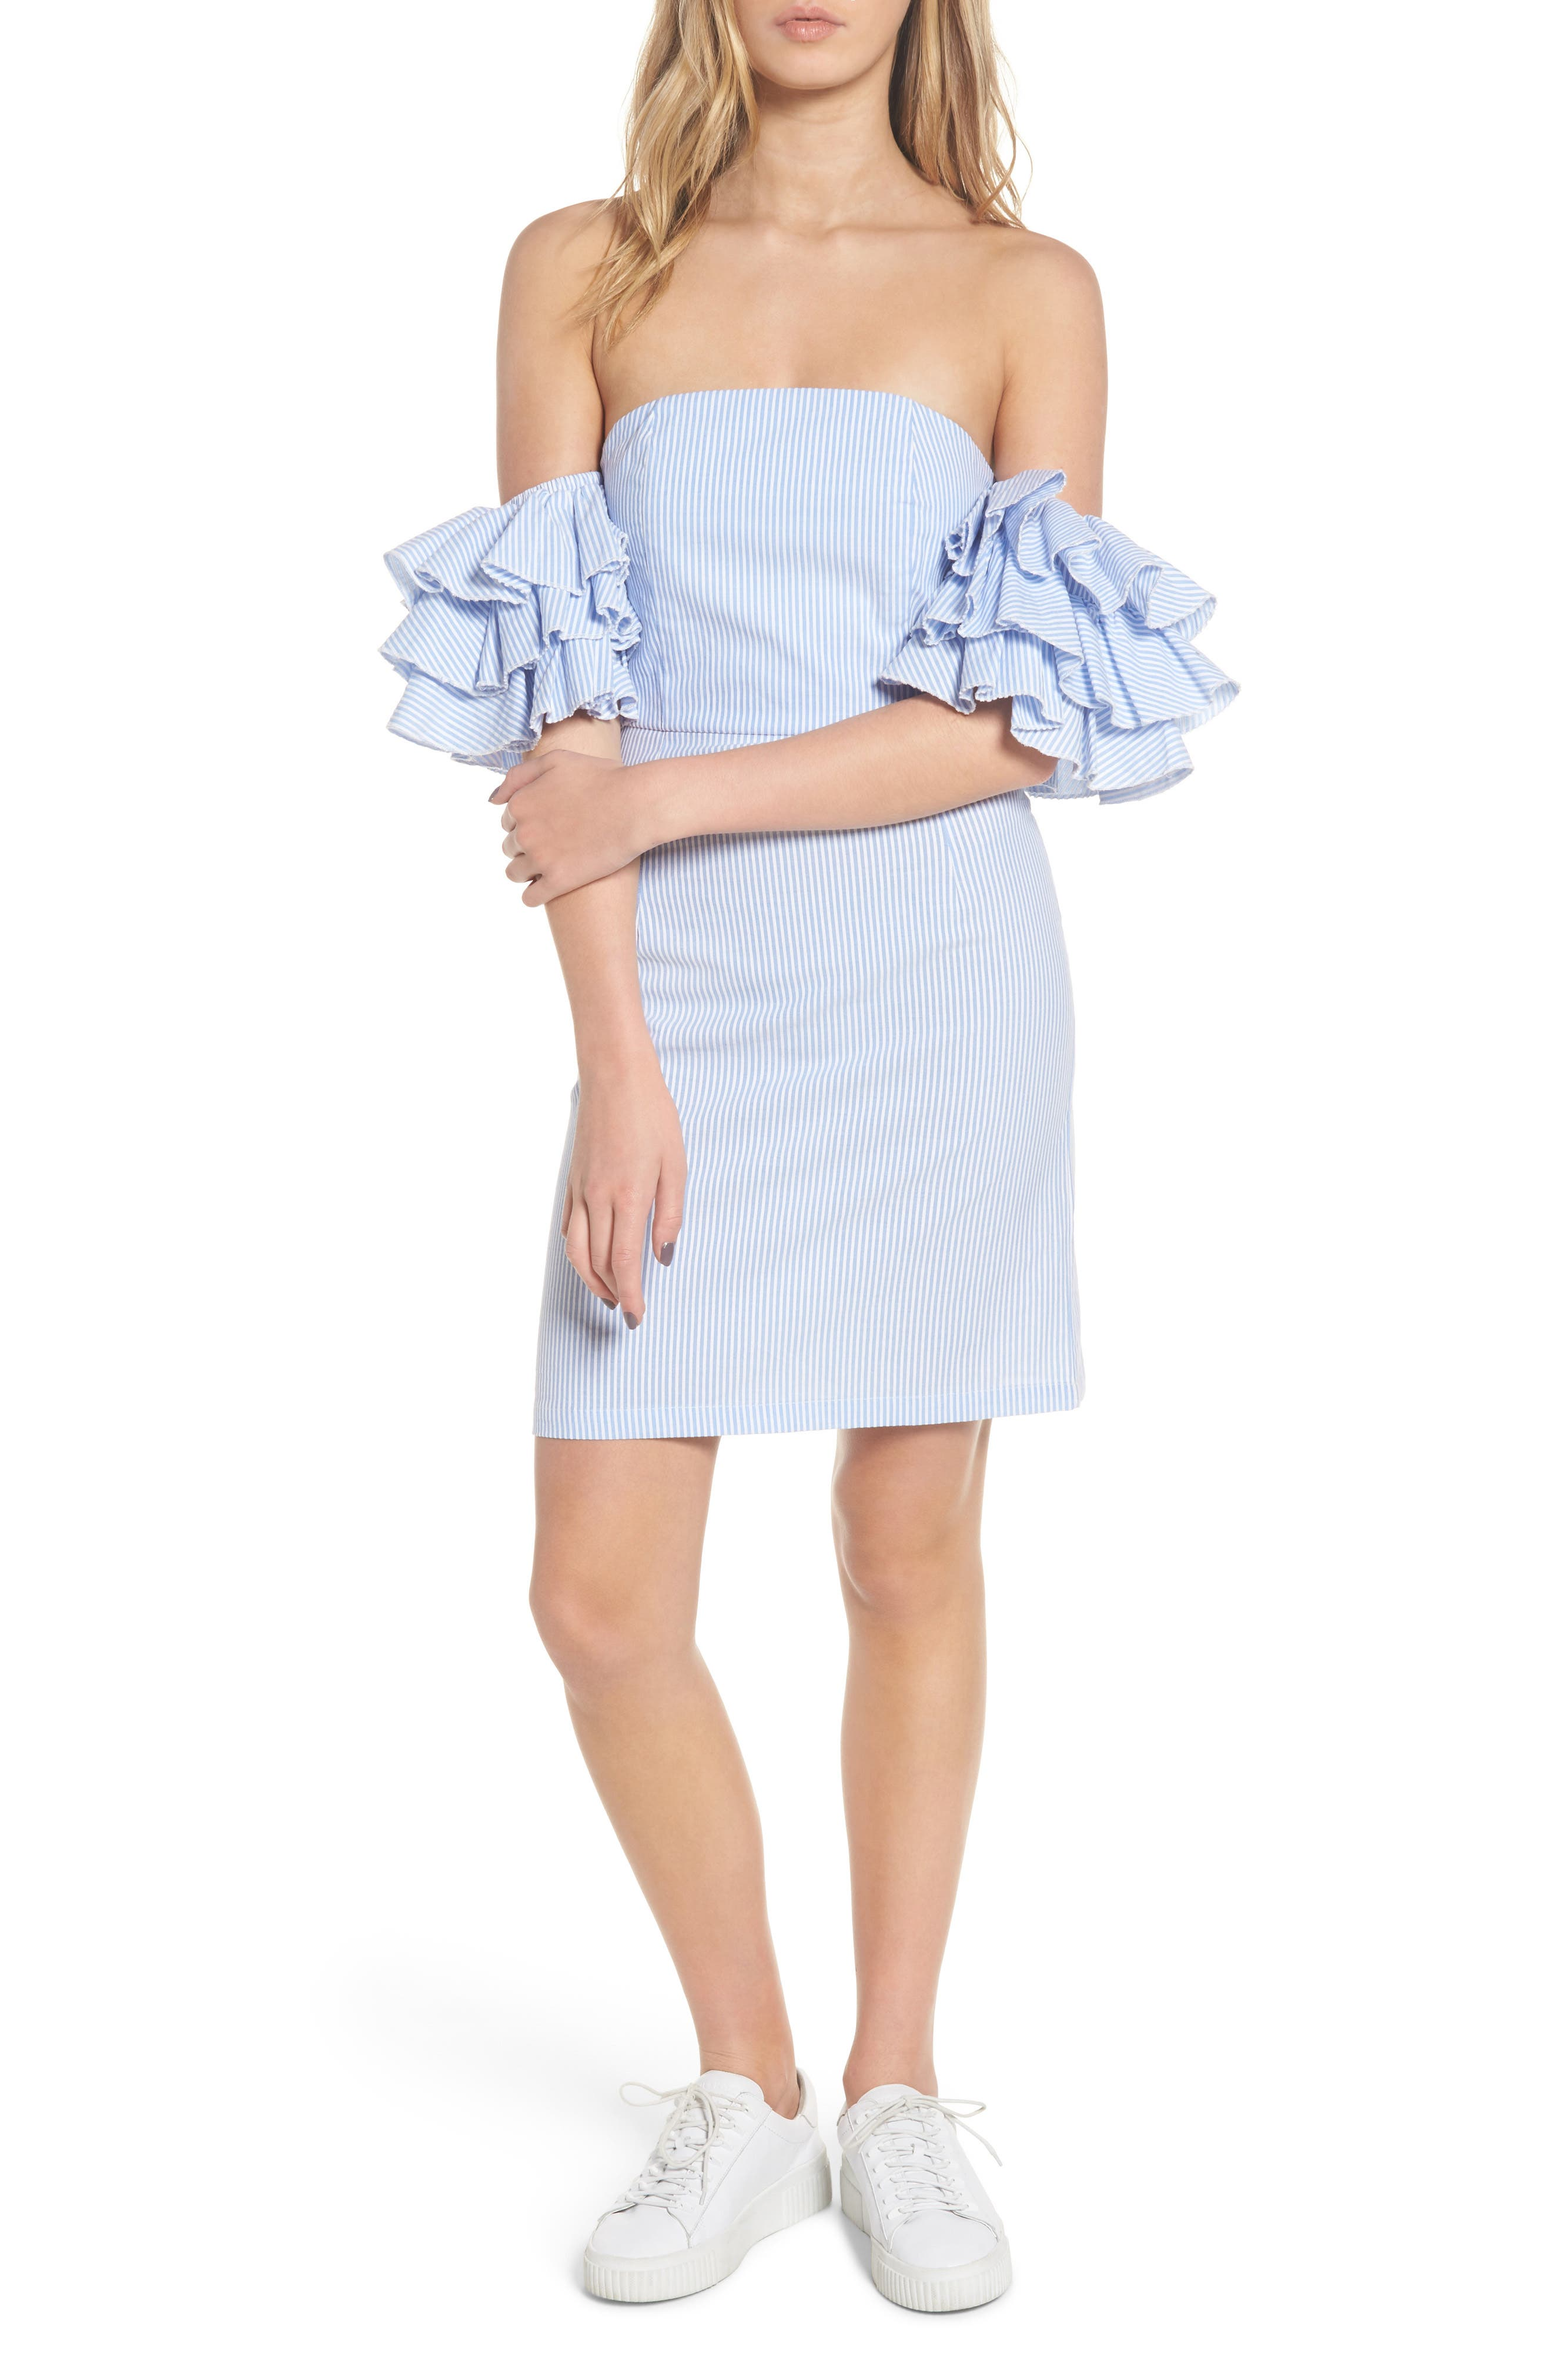 The Malibu Off the Shoulder Dress,                         Main,                         color, 420